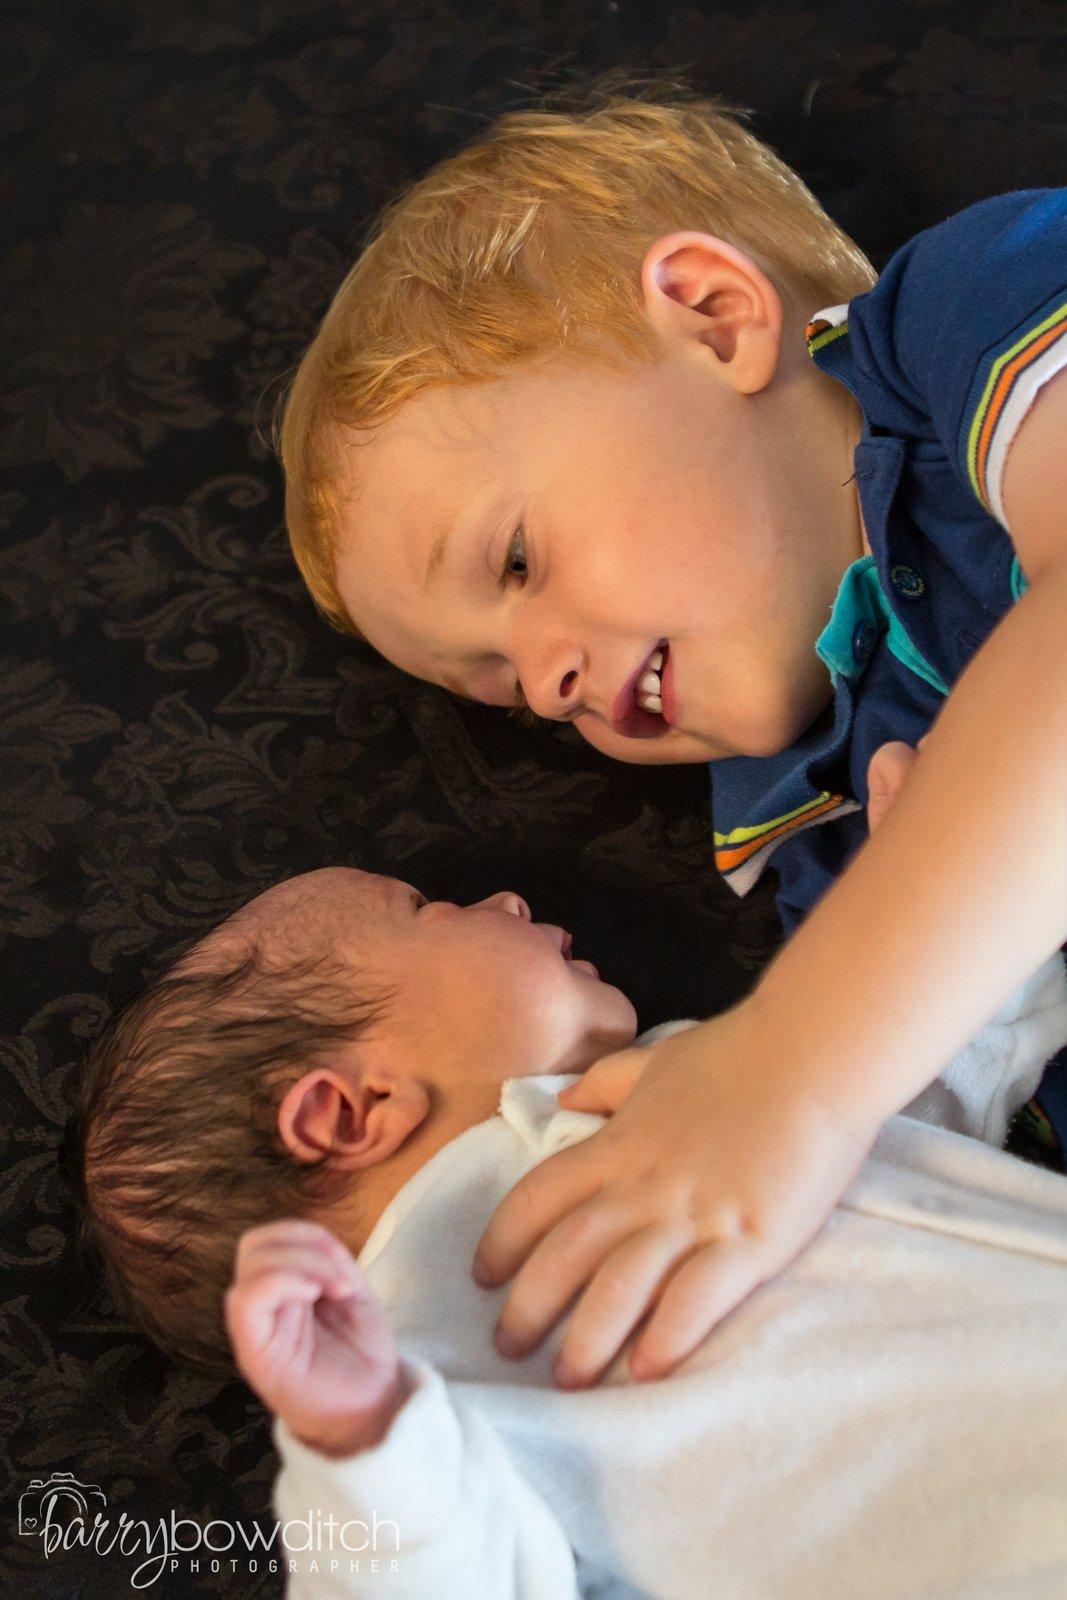 Newborn - Bowditch Photography